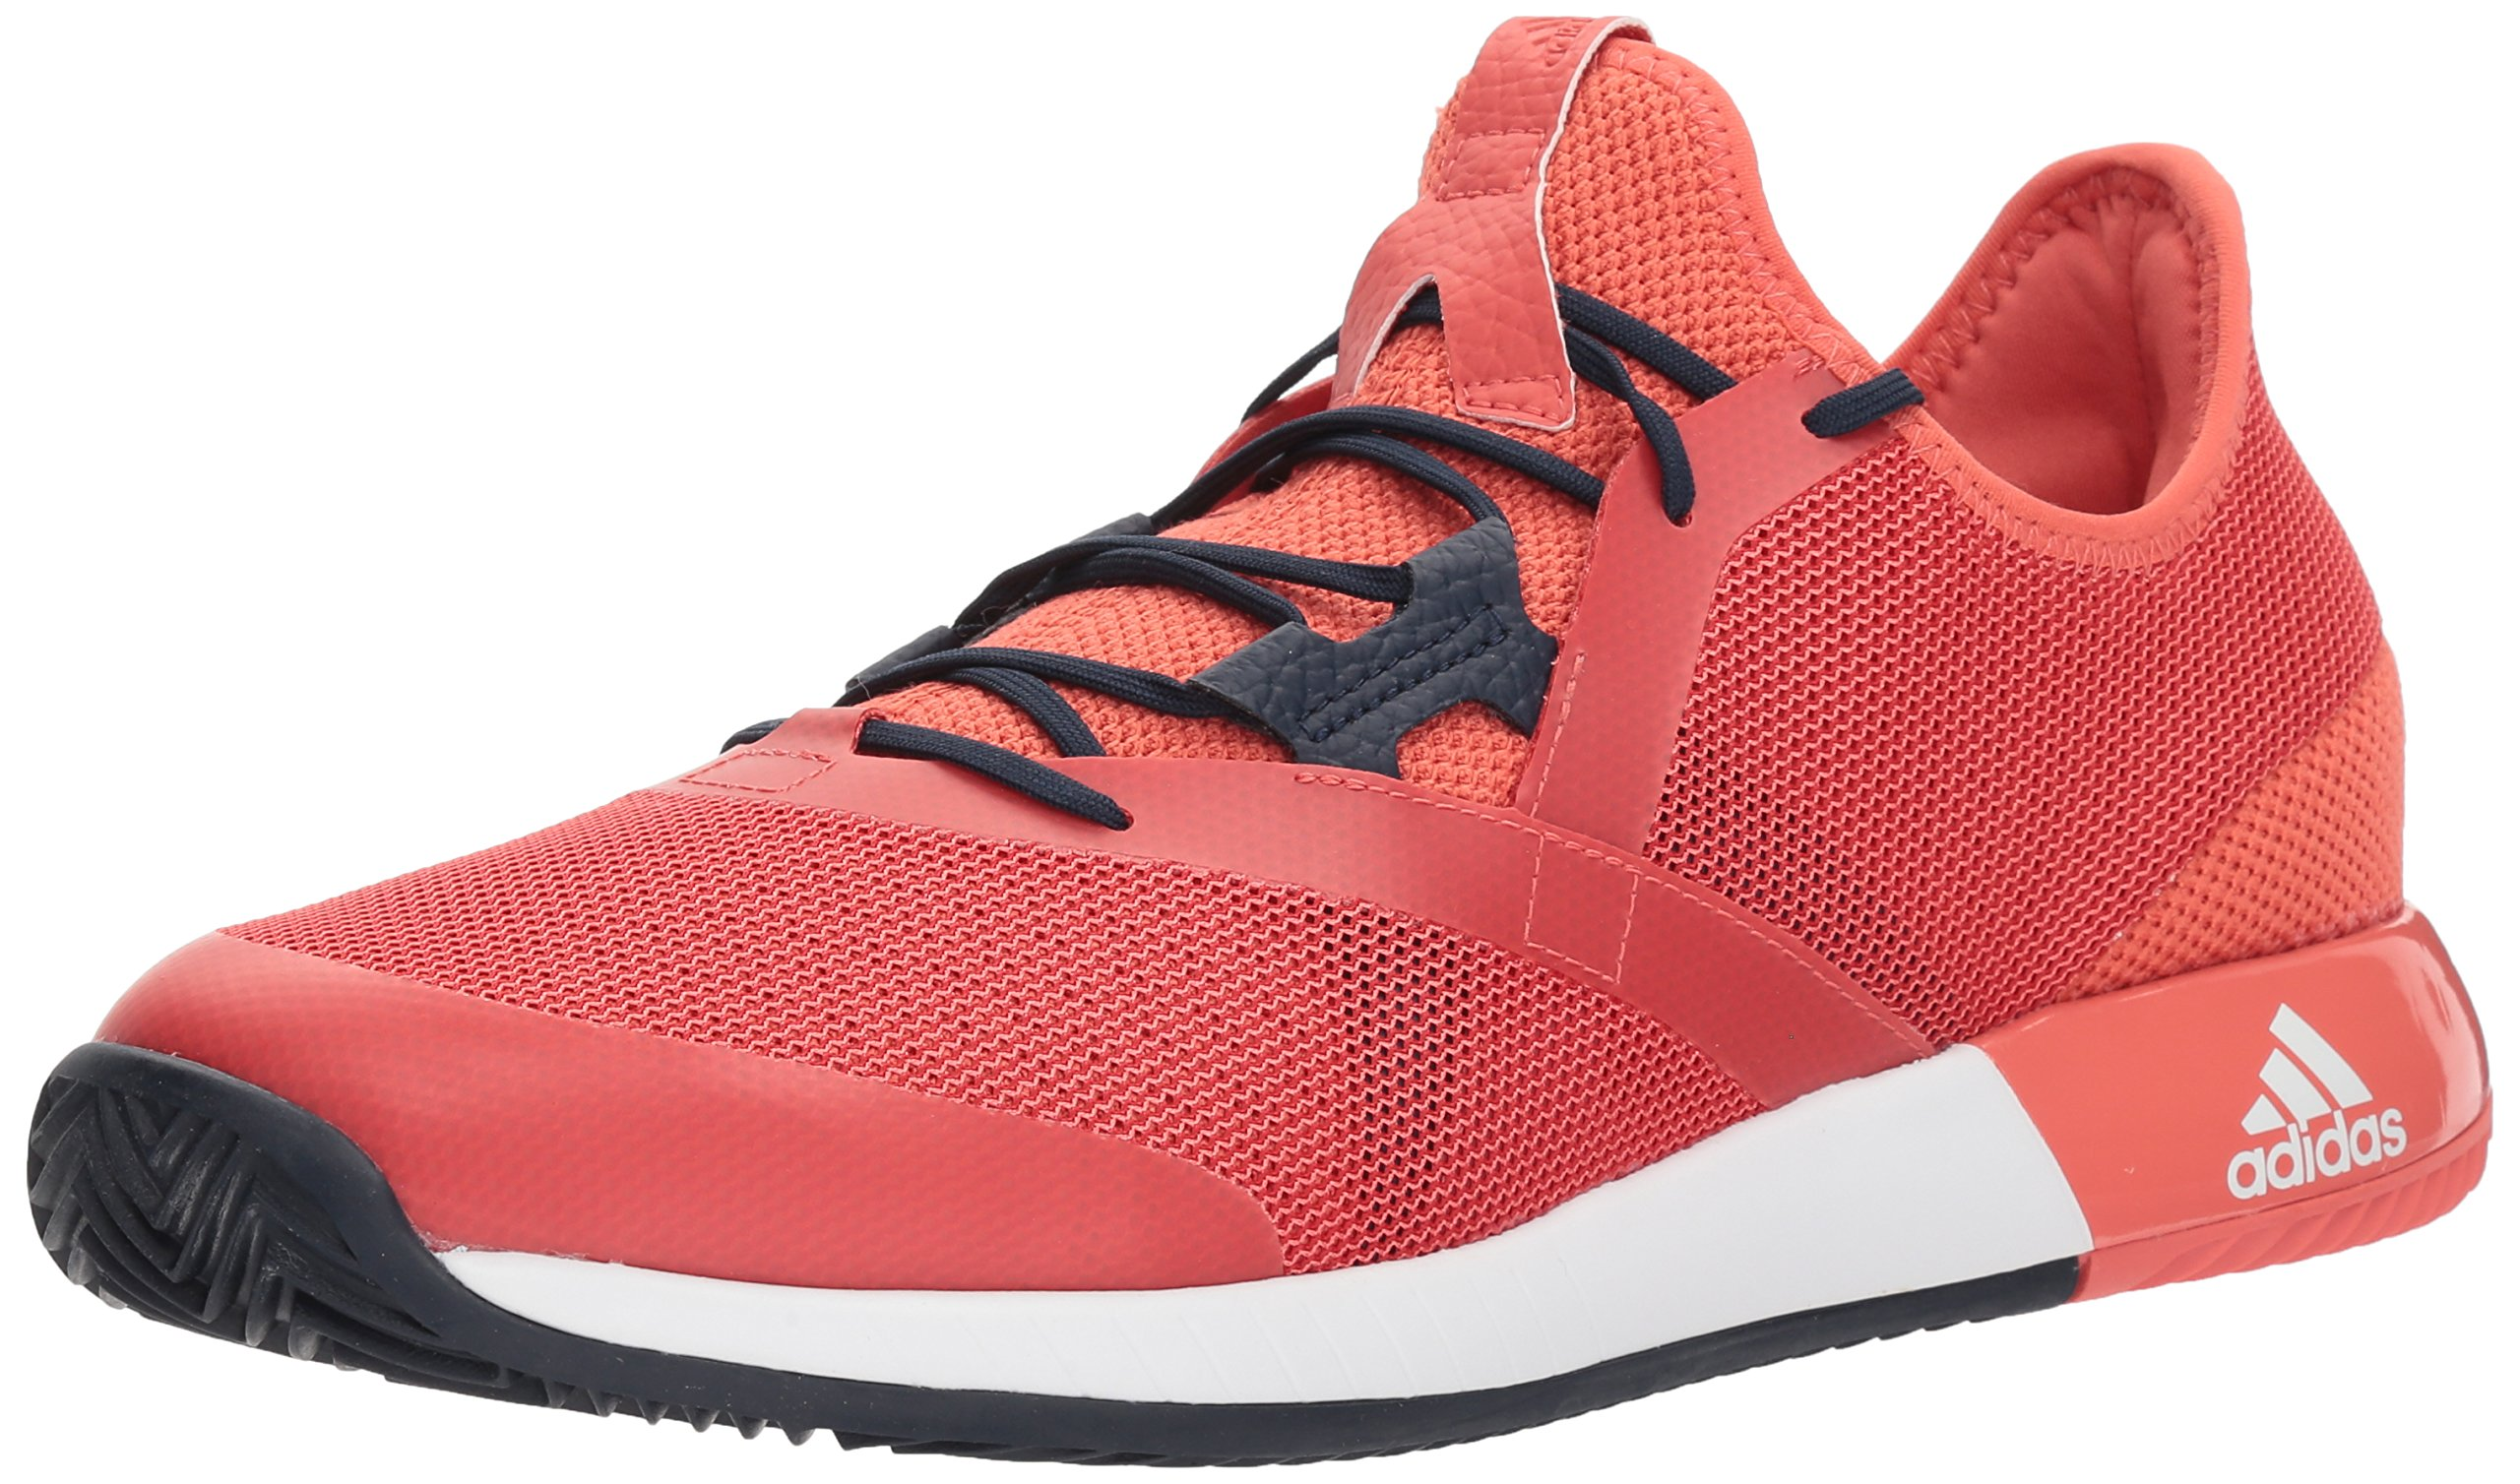 adidas Men's Adizero Defiant Bounce Tennis Shoe, Trace Scarlet/White/Night Navy, 10 M US by adidas